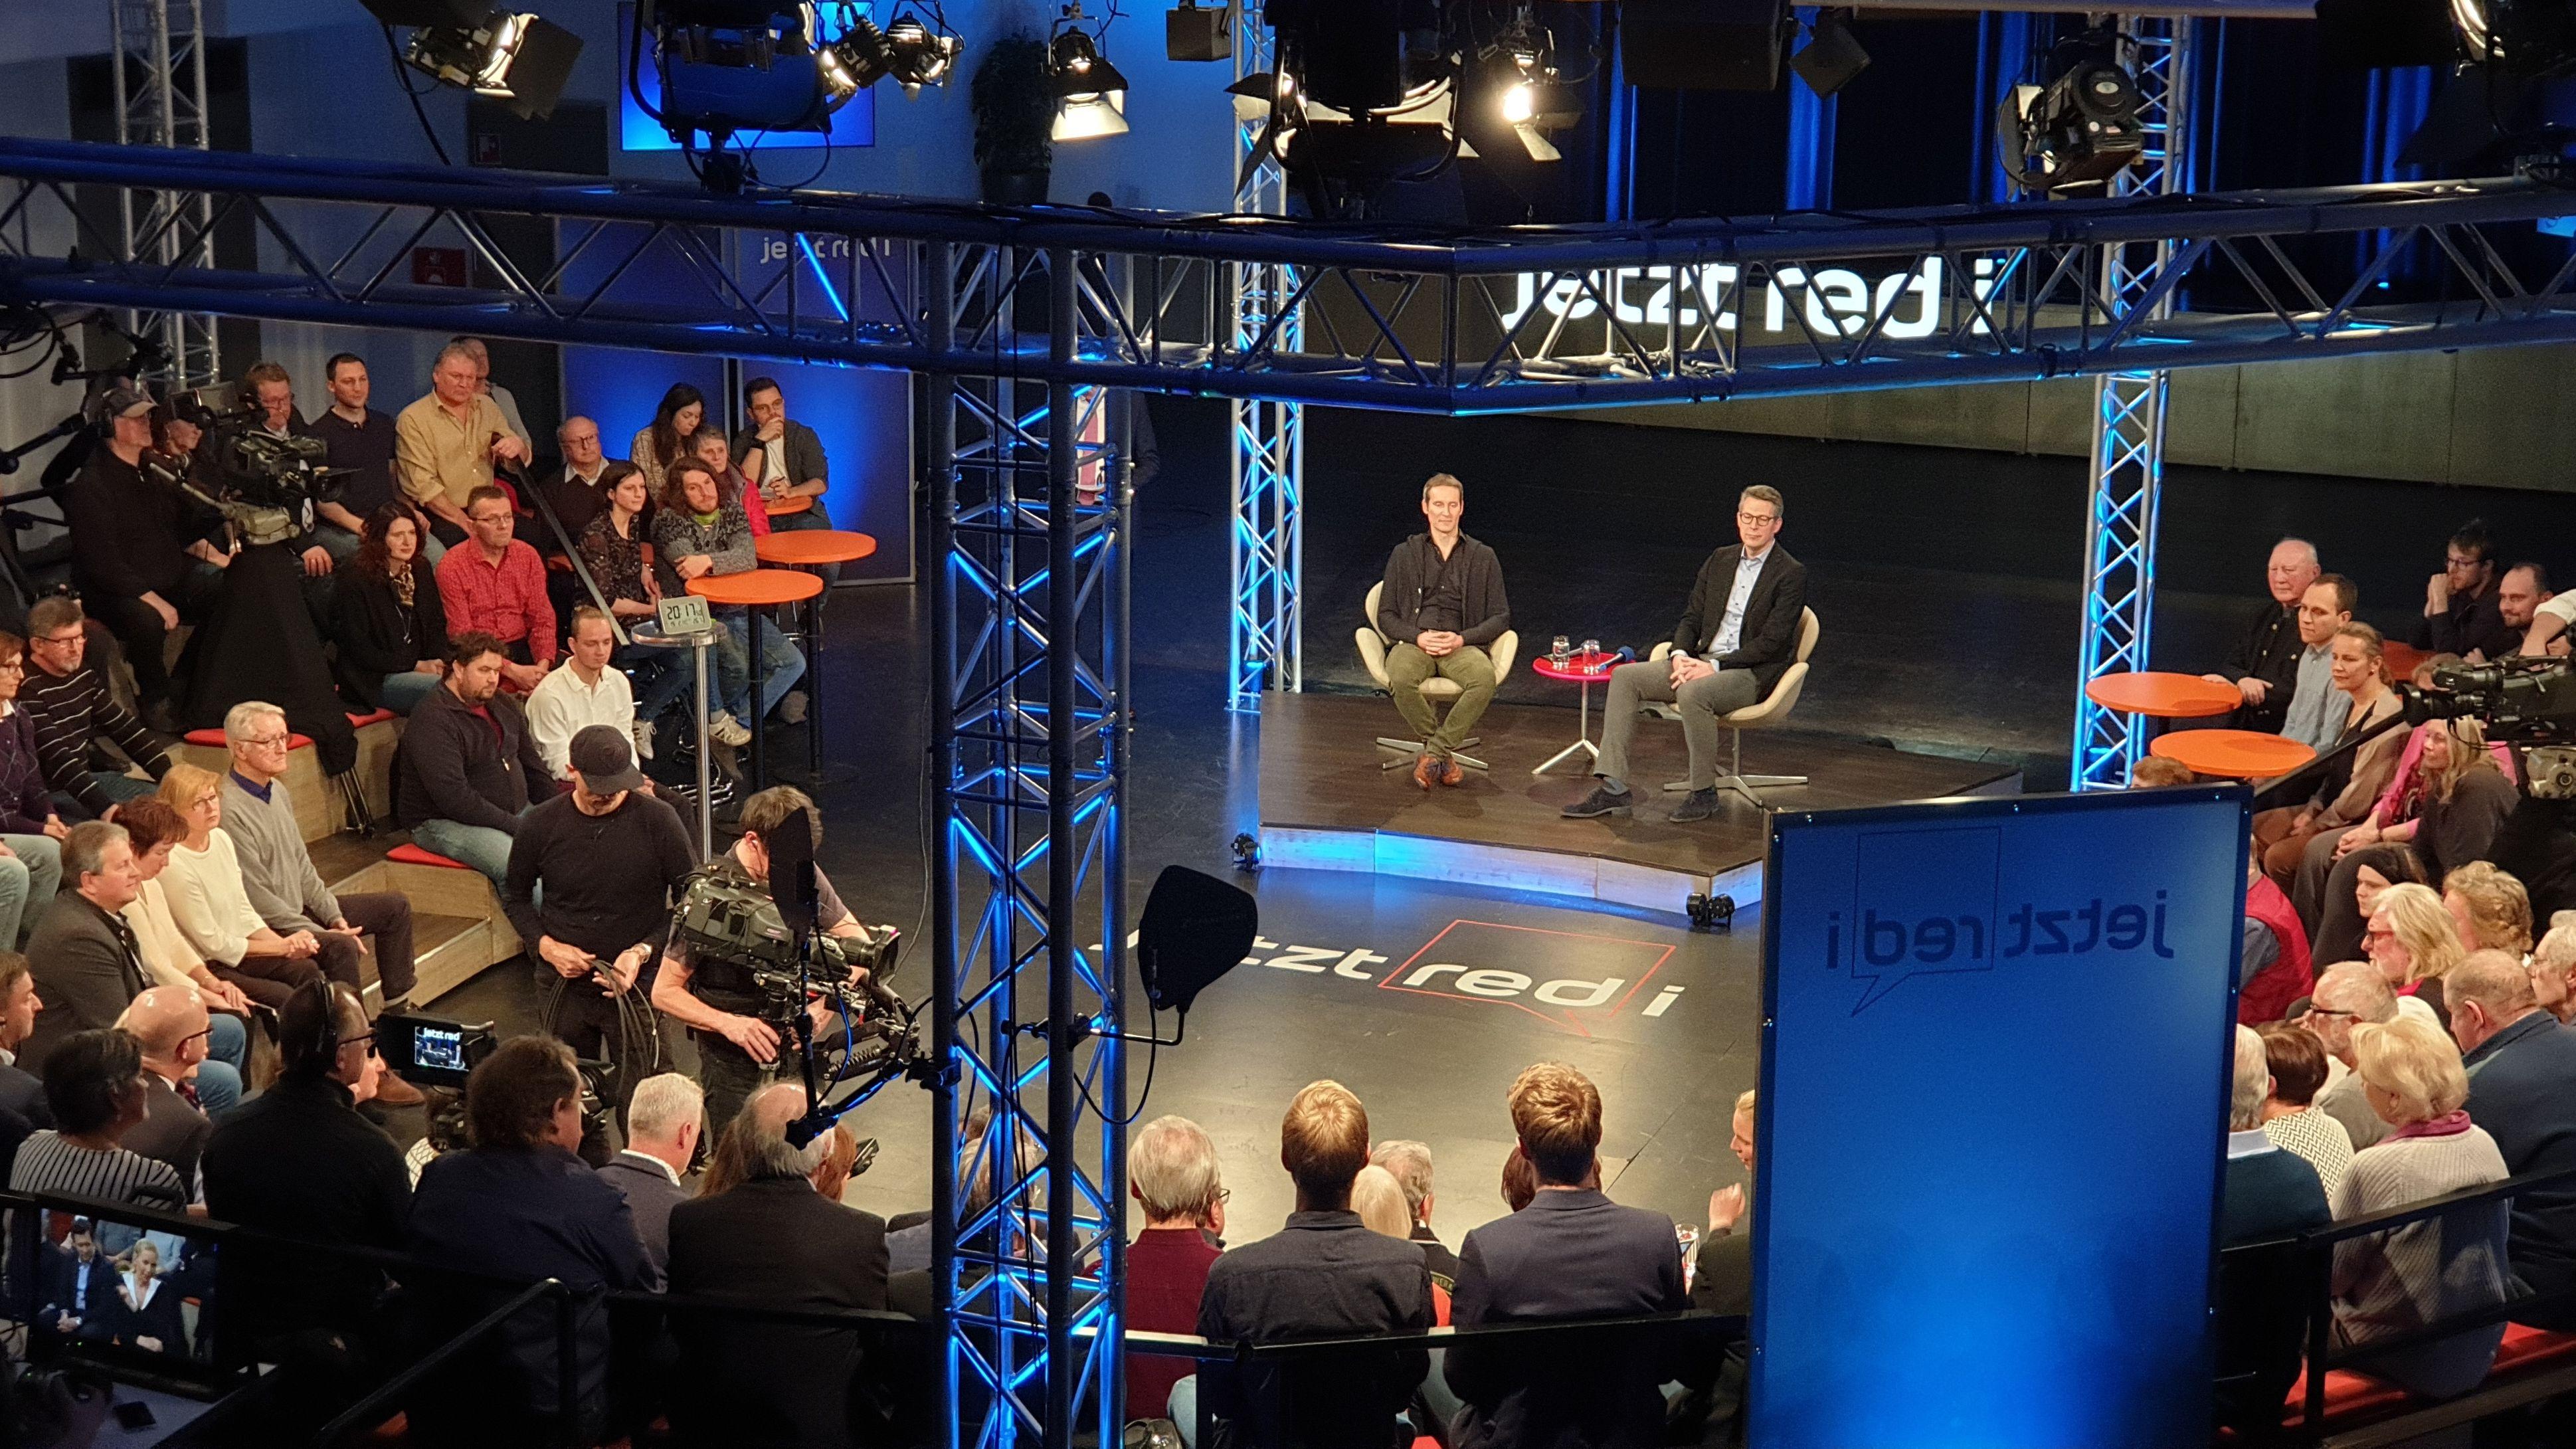 """Jetzti red i"" am 19.02.2020 aus Dingolfing"